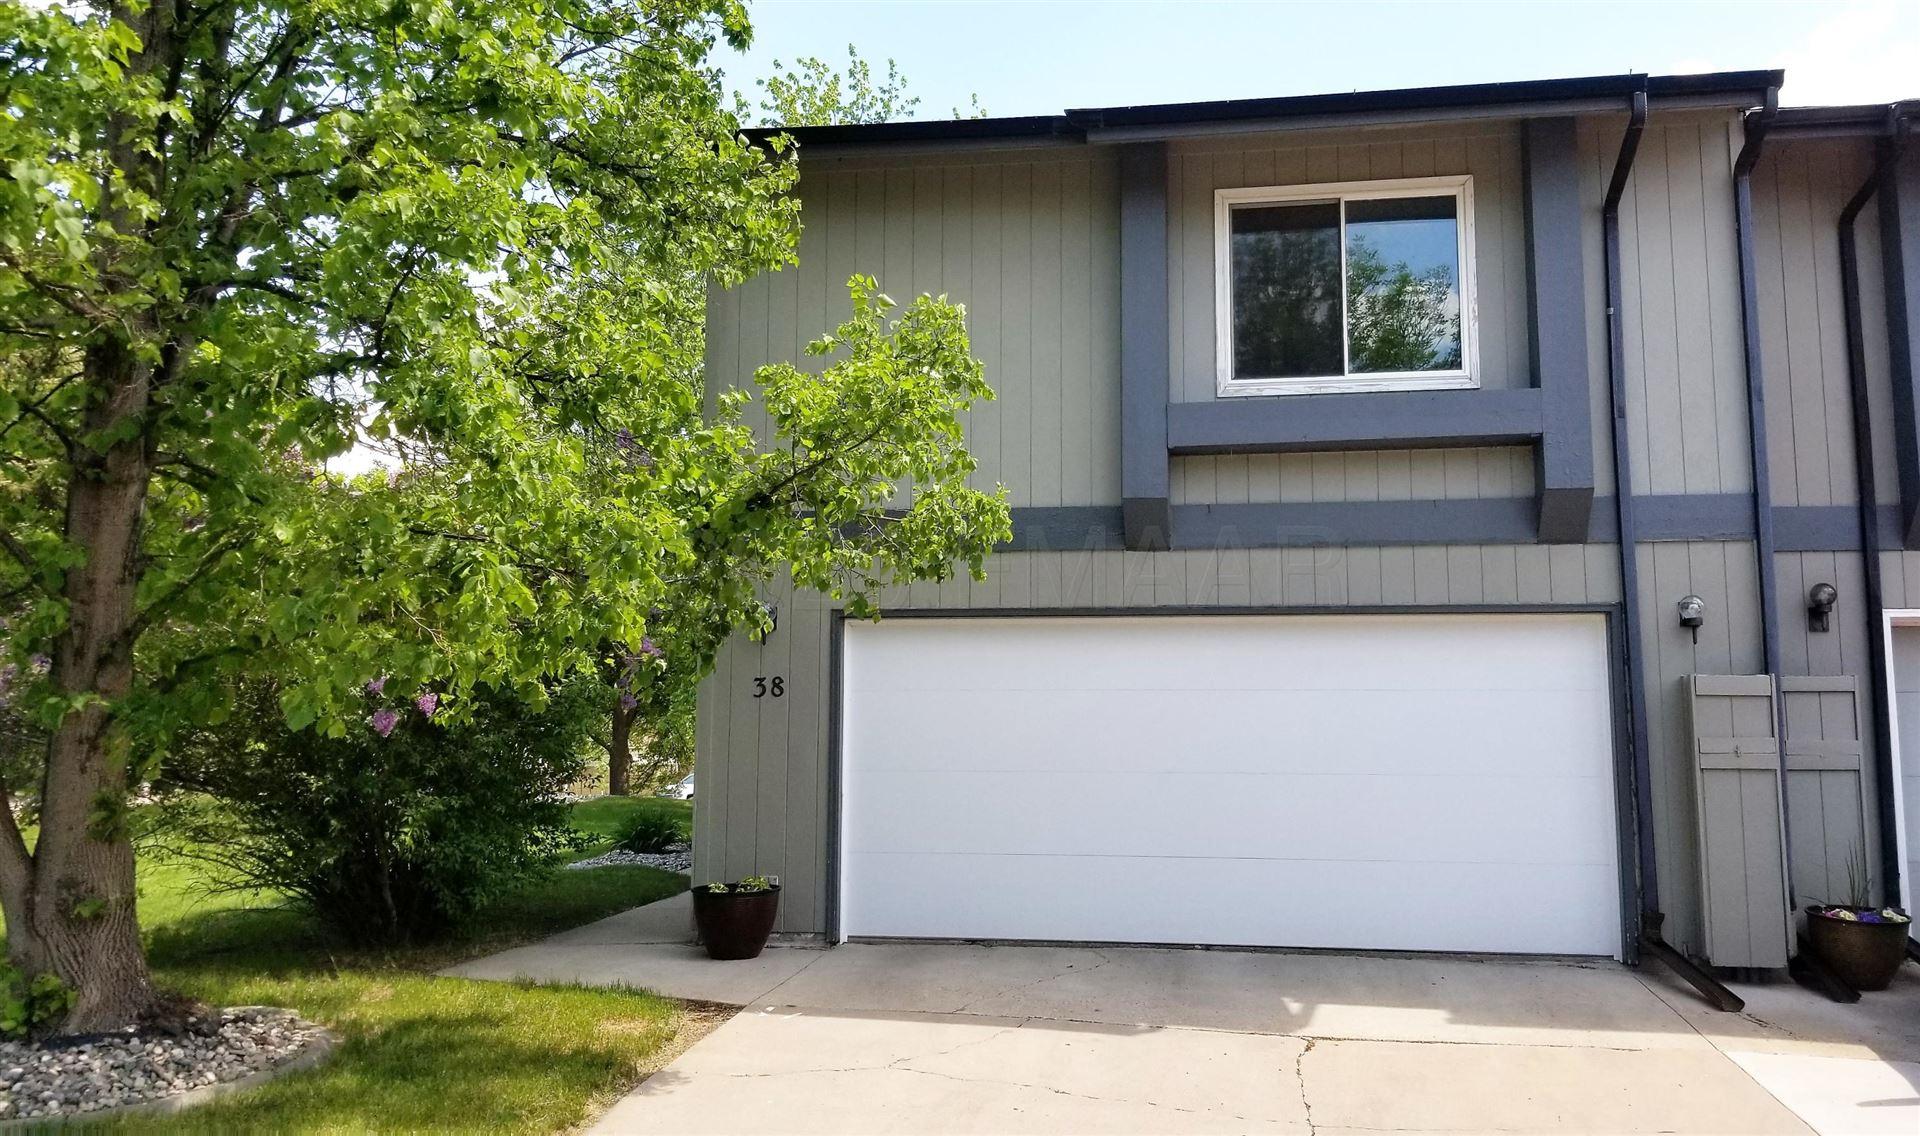 38 FREMONT Drive S, Fargo, ND 58103 - #: 20-1341